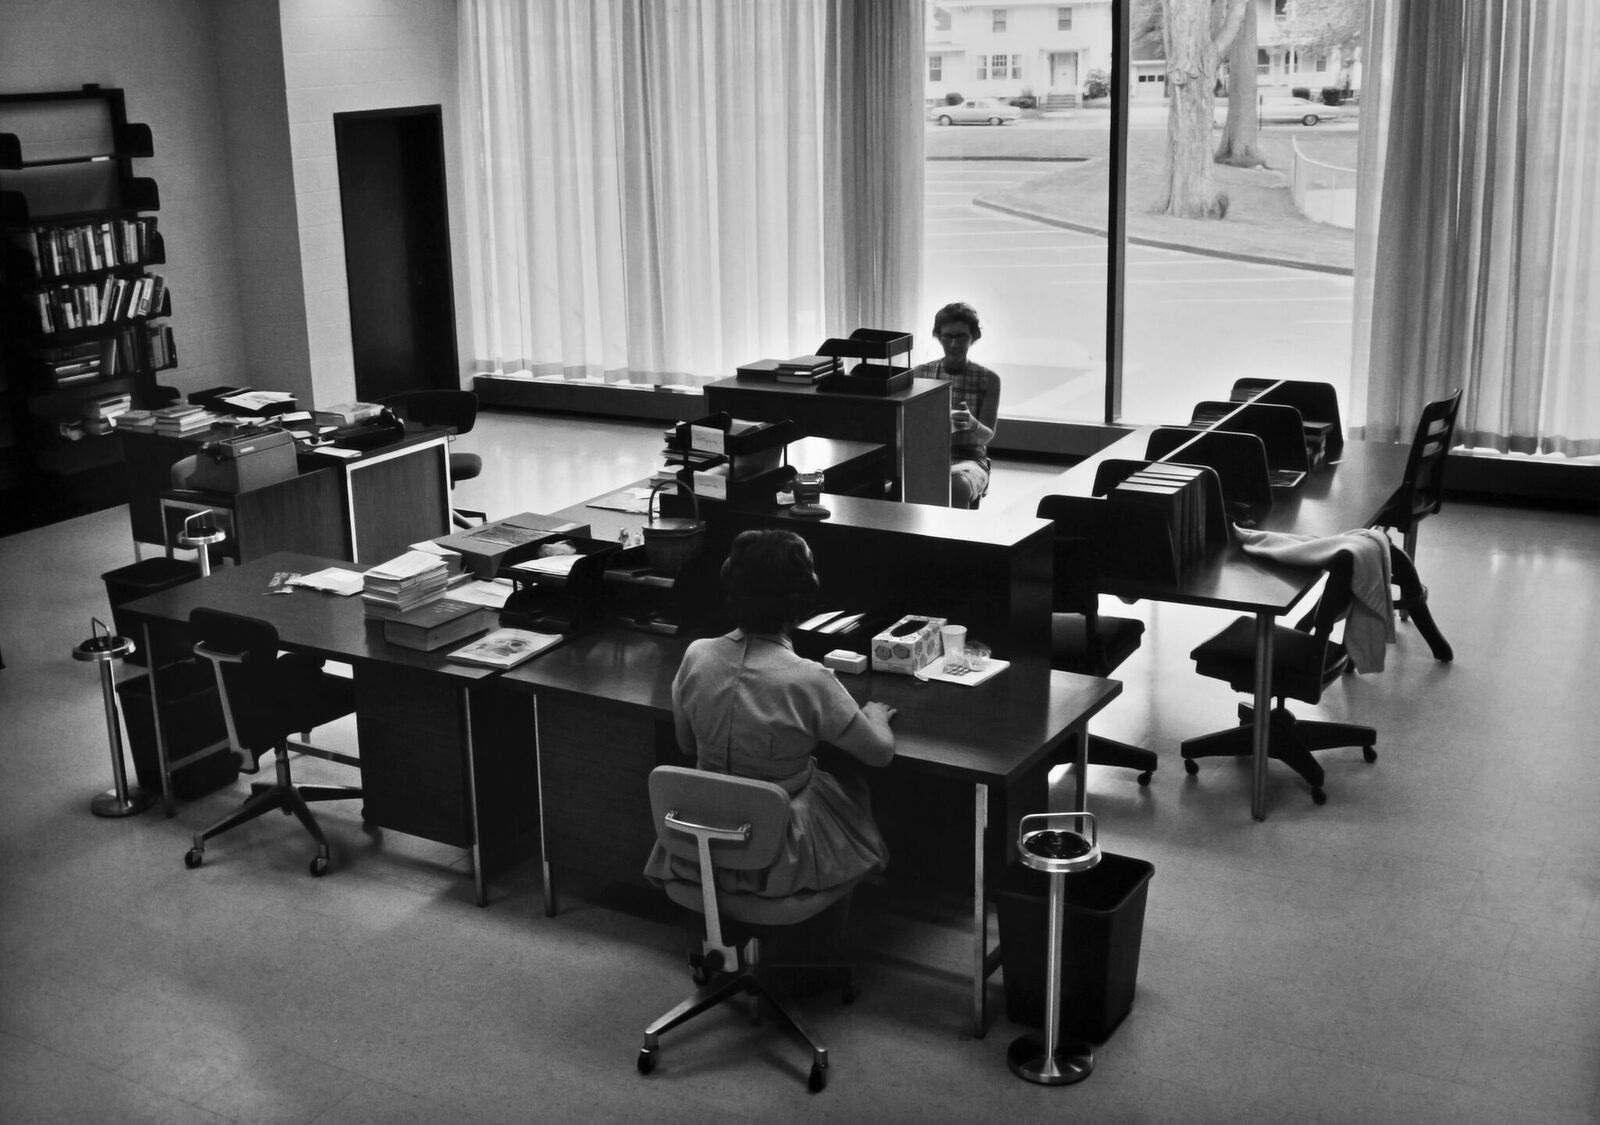 SouthPortland_Broadway_482_PublicLibary_1960s_work_stations_CHRISTOPHER_GRASSE.jpg